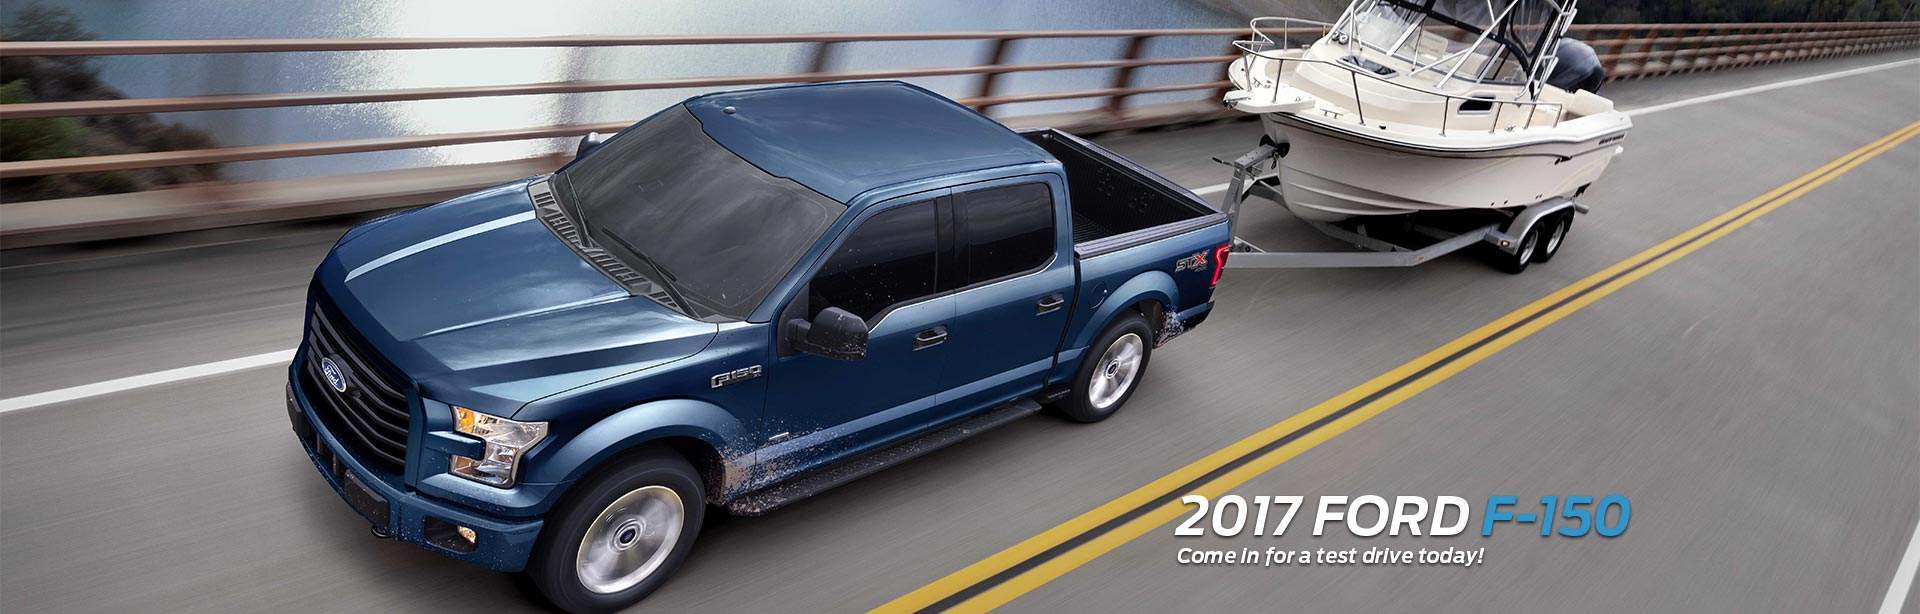 Dodge Dealership Cullman Al 2018 Dodge Reviews